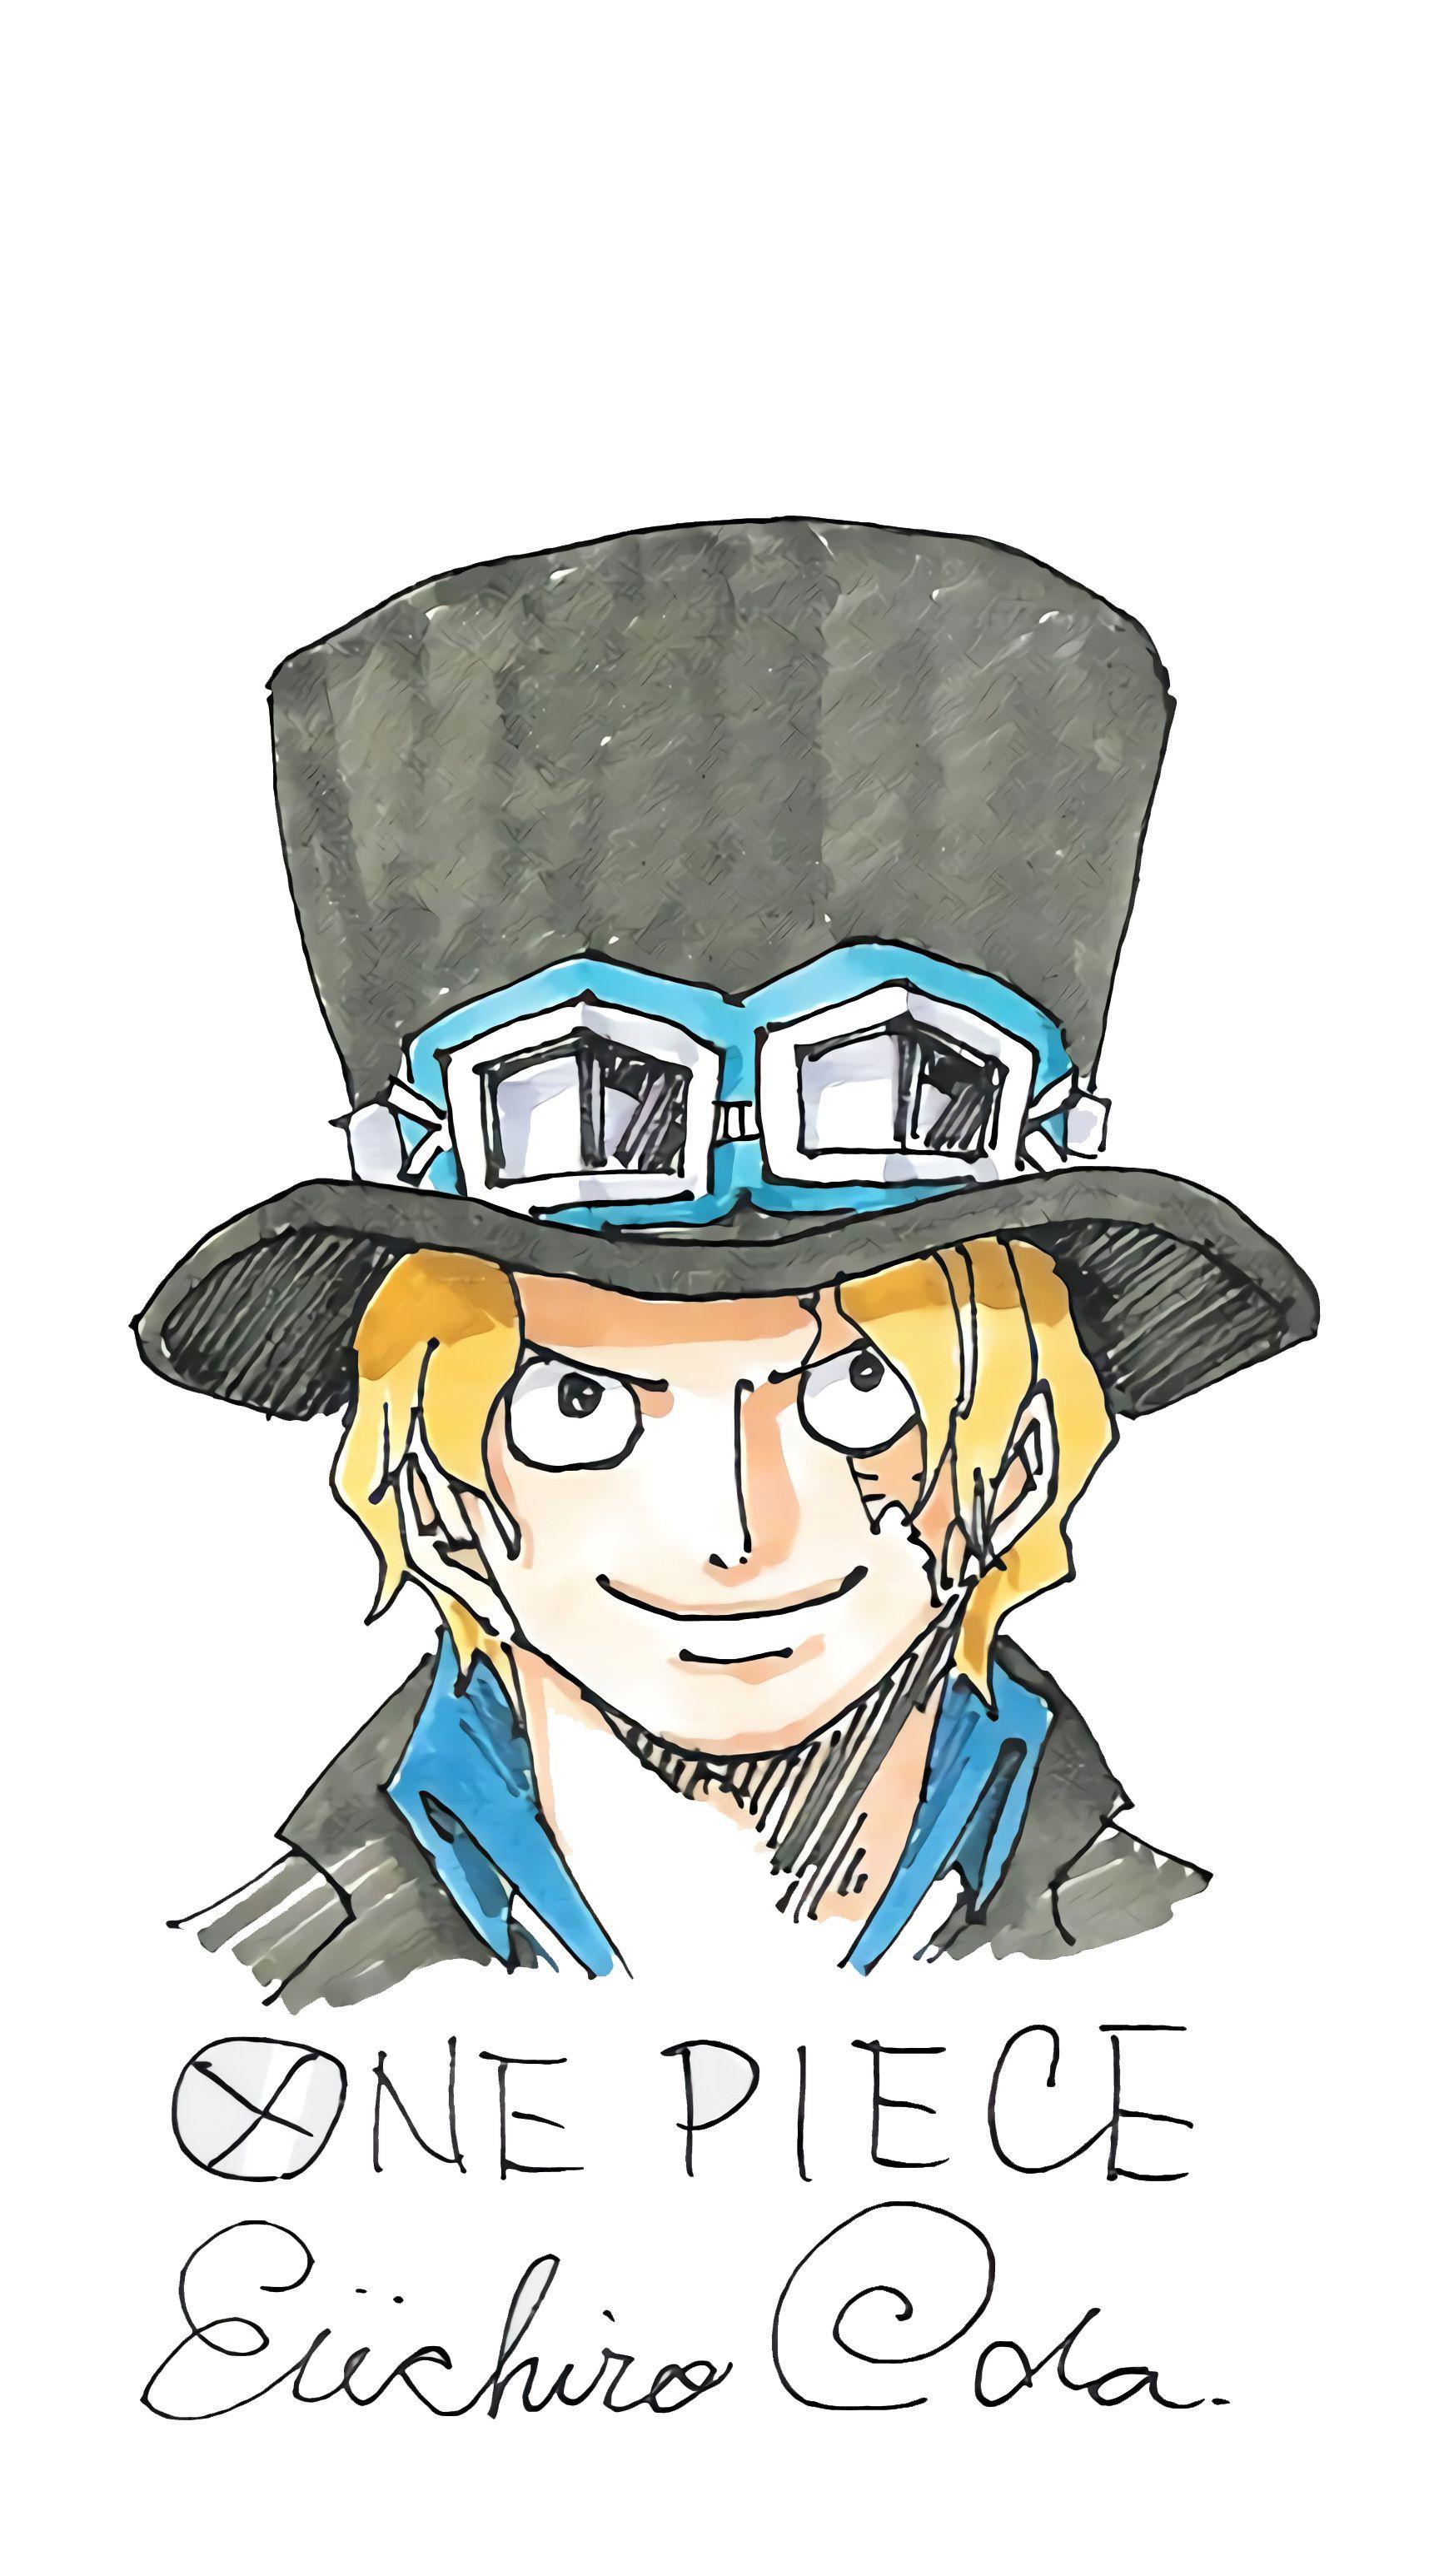 Sabo One Piece Onepiece Sabo Eiichirooda Onepiece イラスト サボル 可愛いイラスト